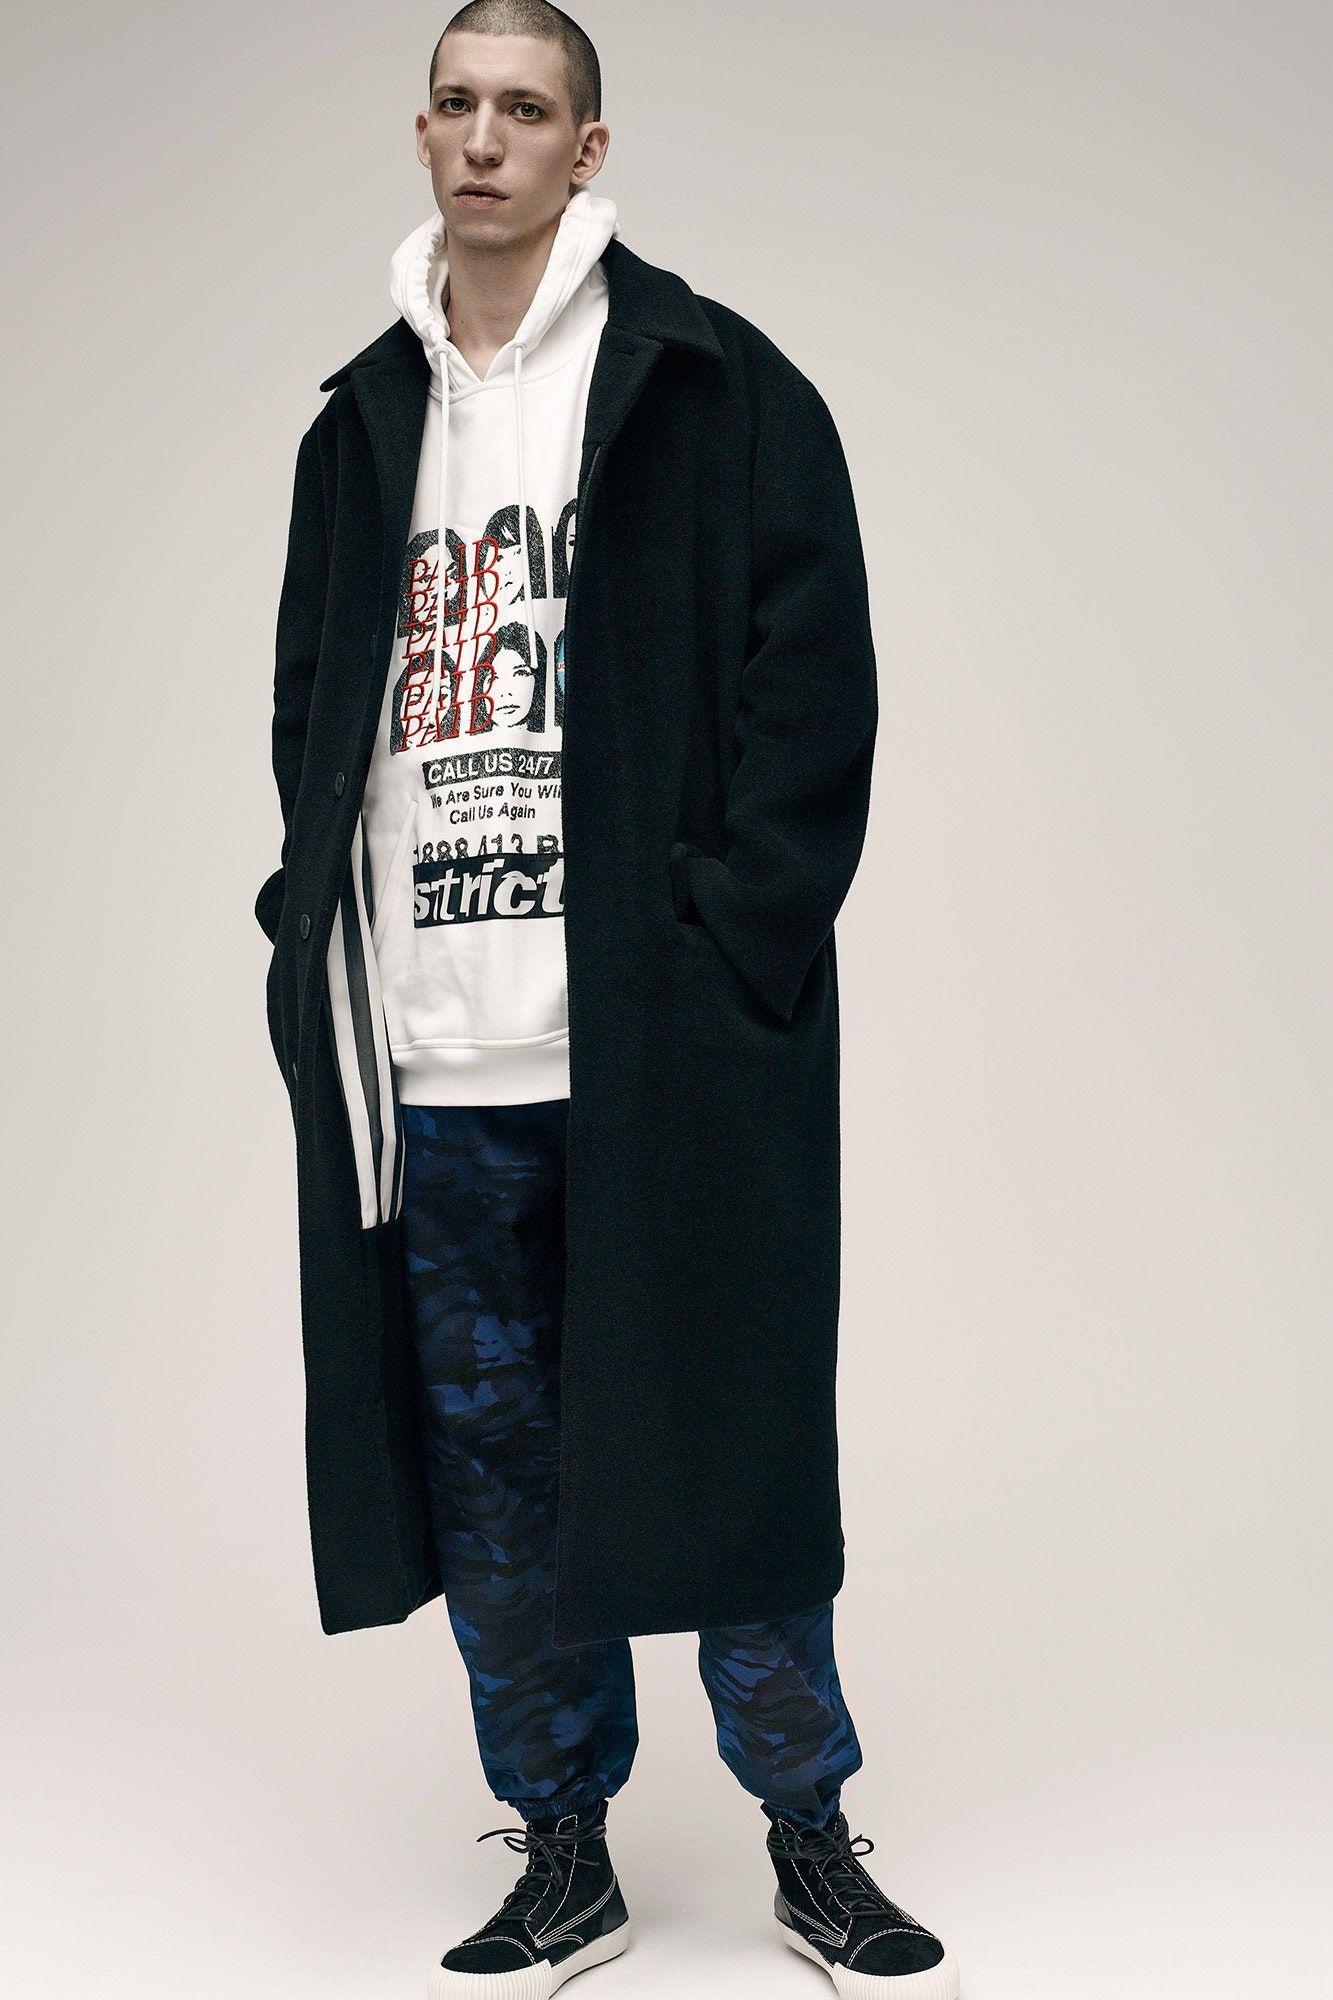 Alexander Wang Fall/Winter 2016 Menswear худи